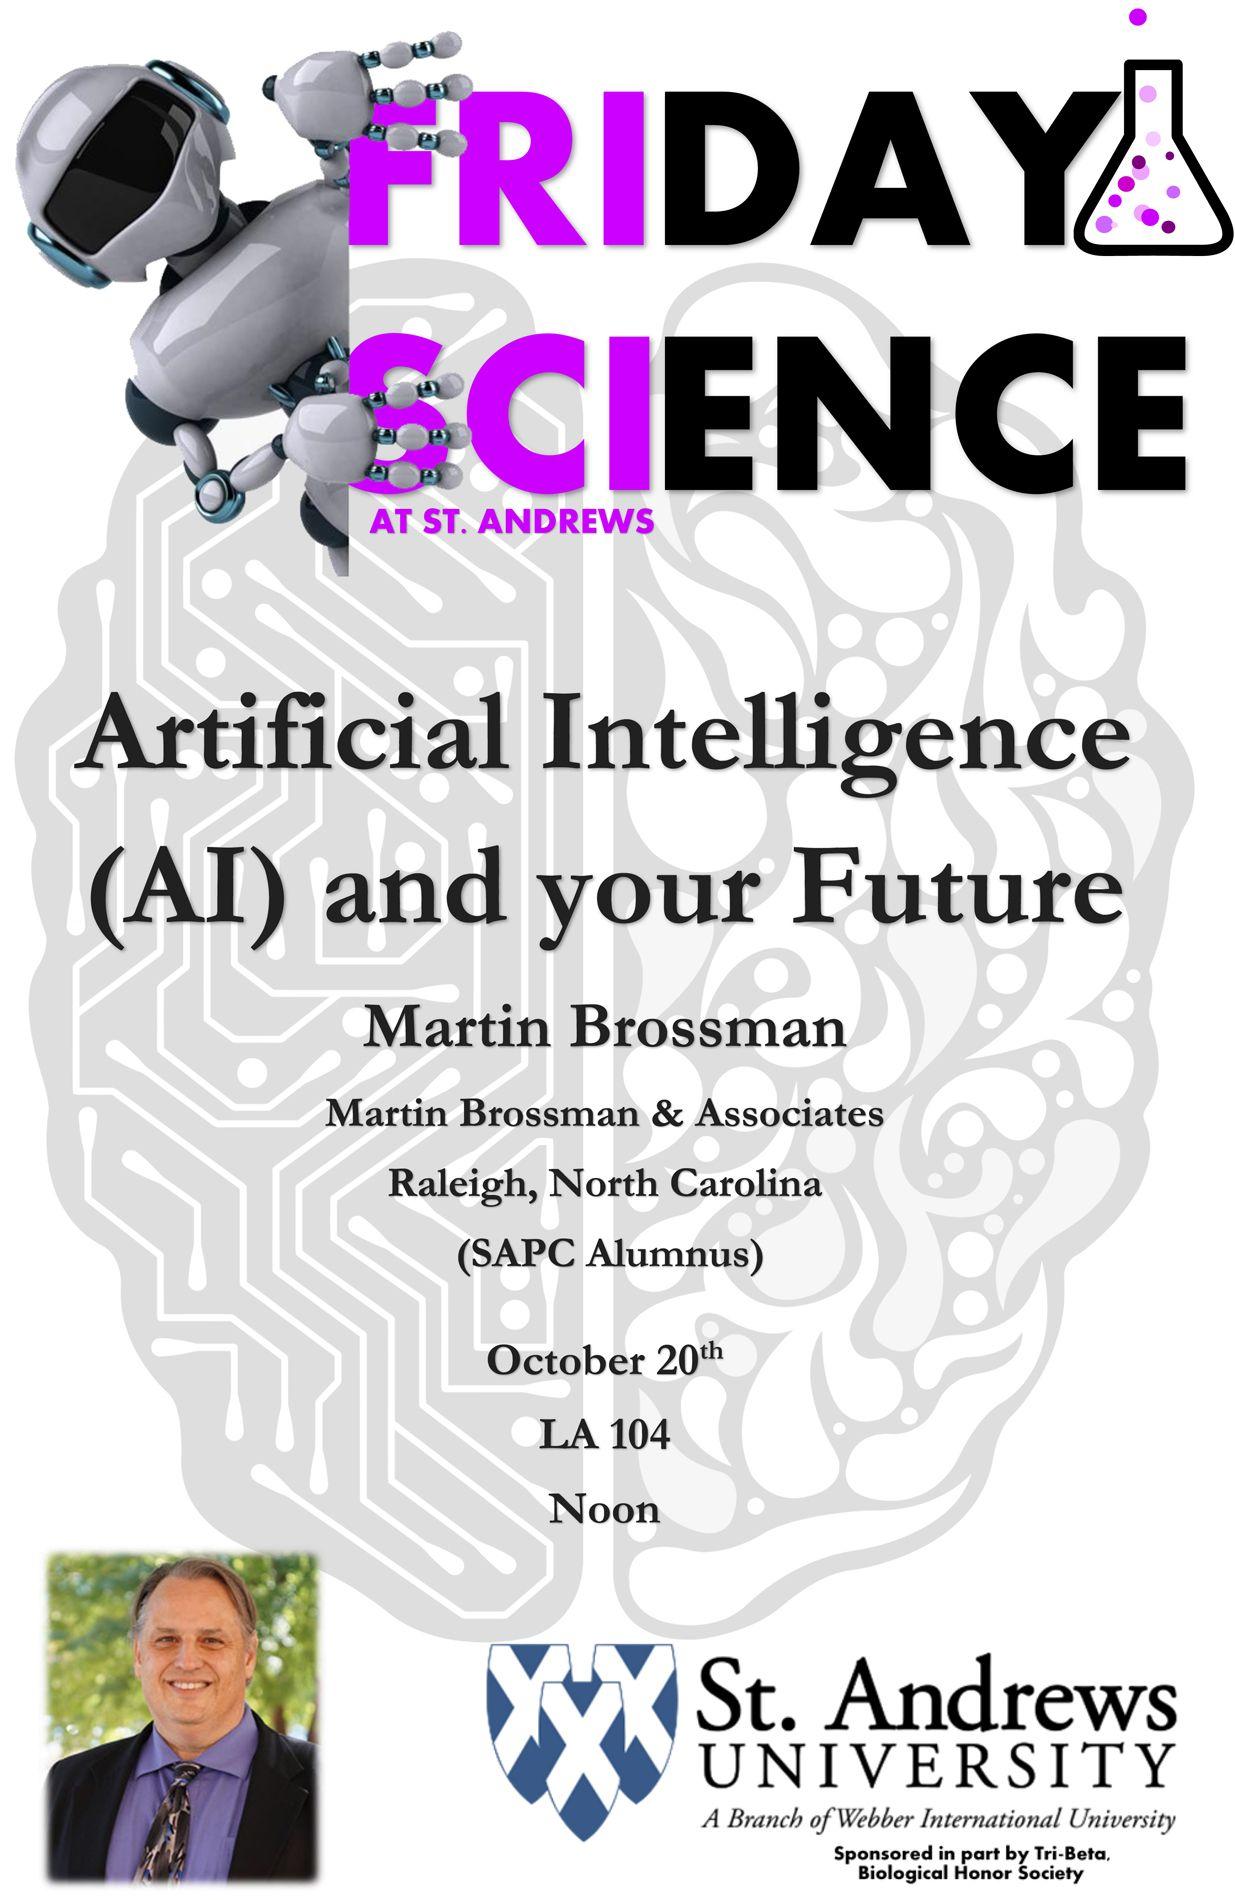 Friday Science Talk with Martin Brossman